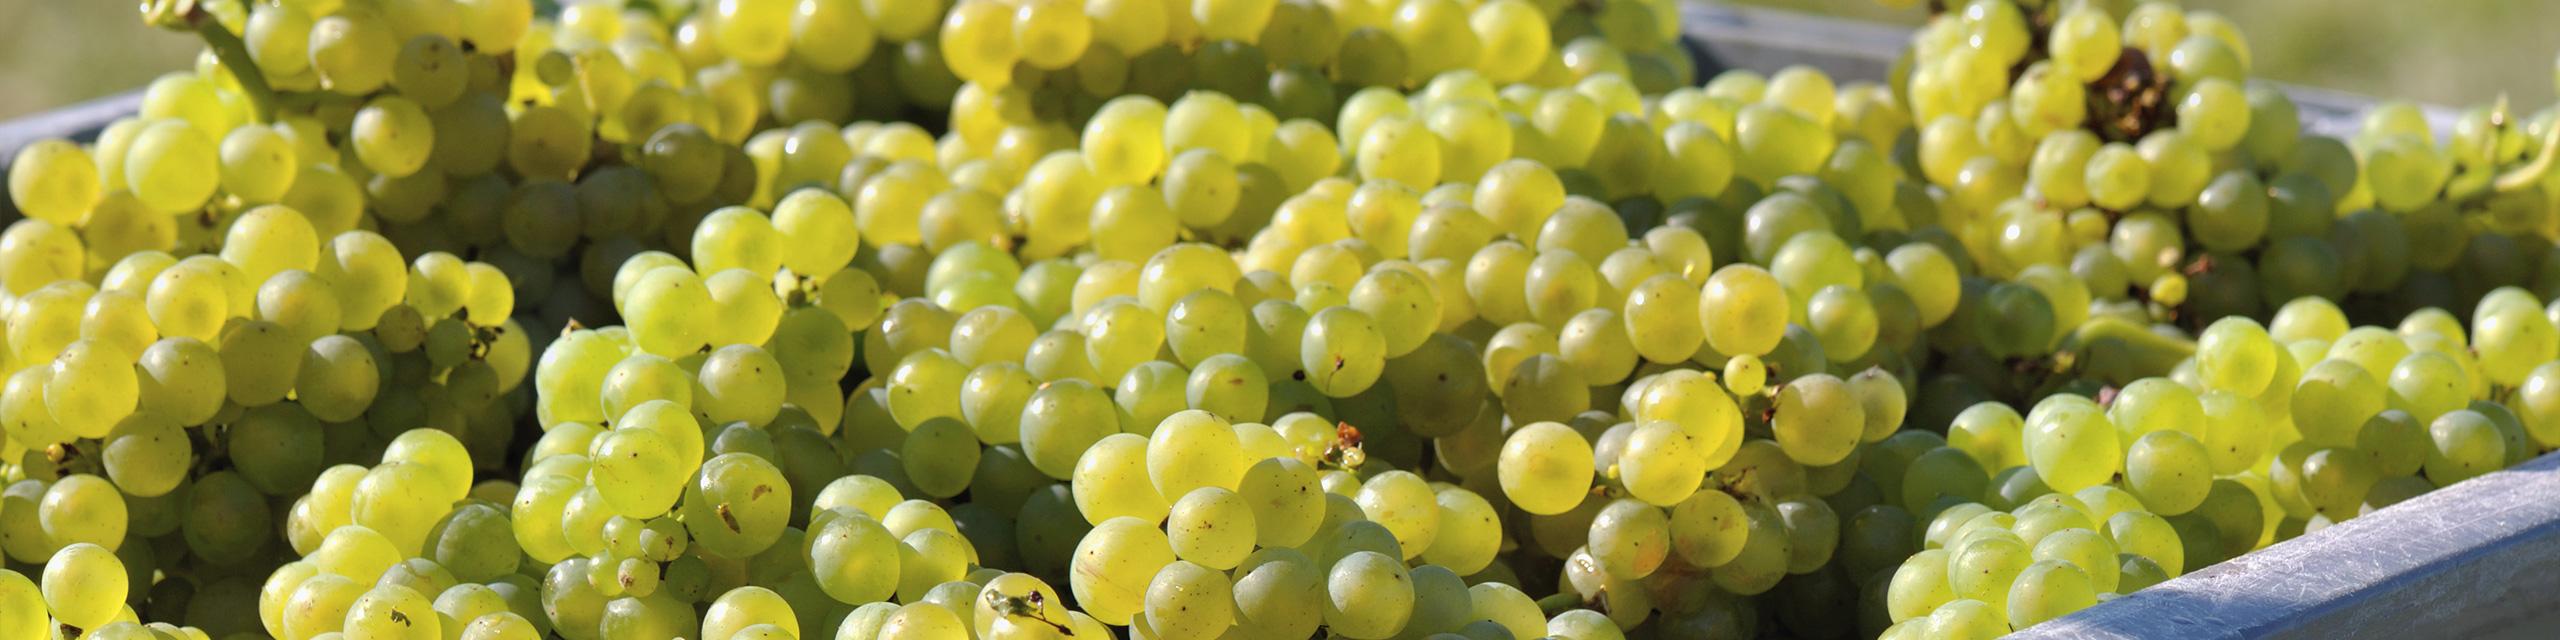 opération viticole marne